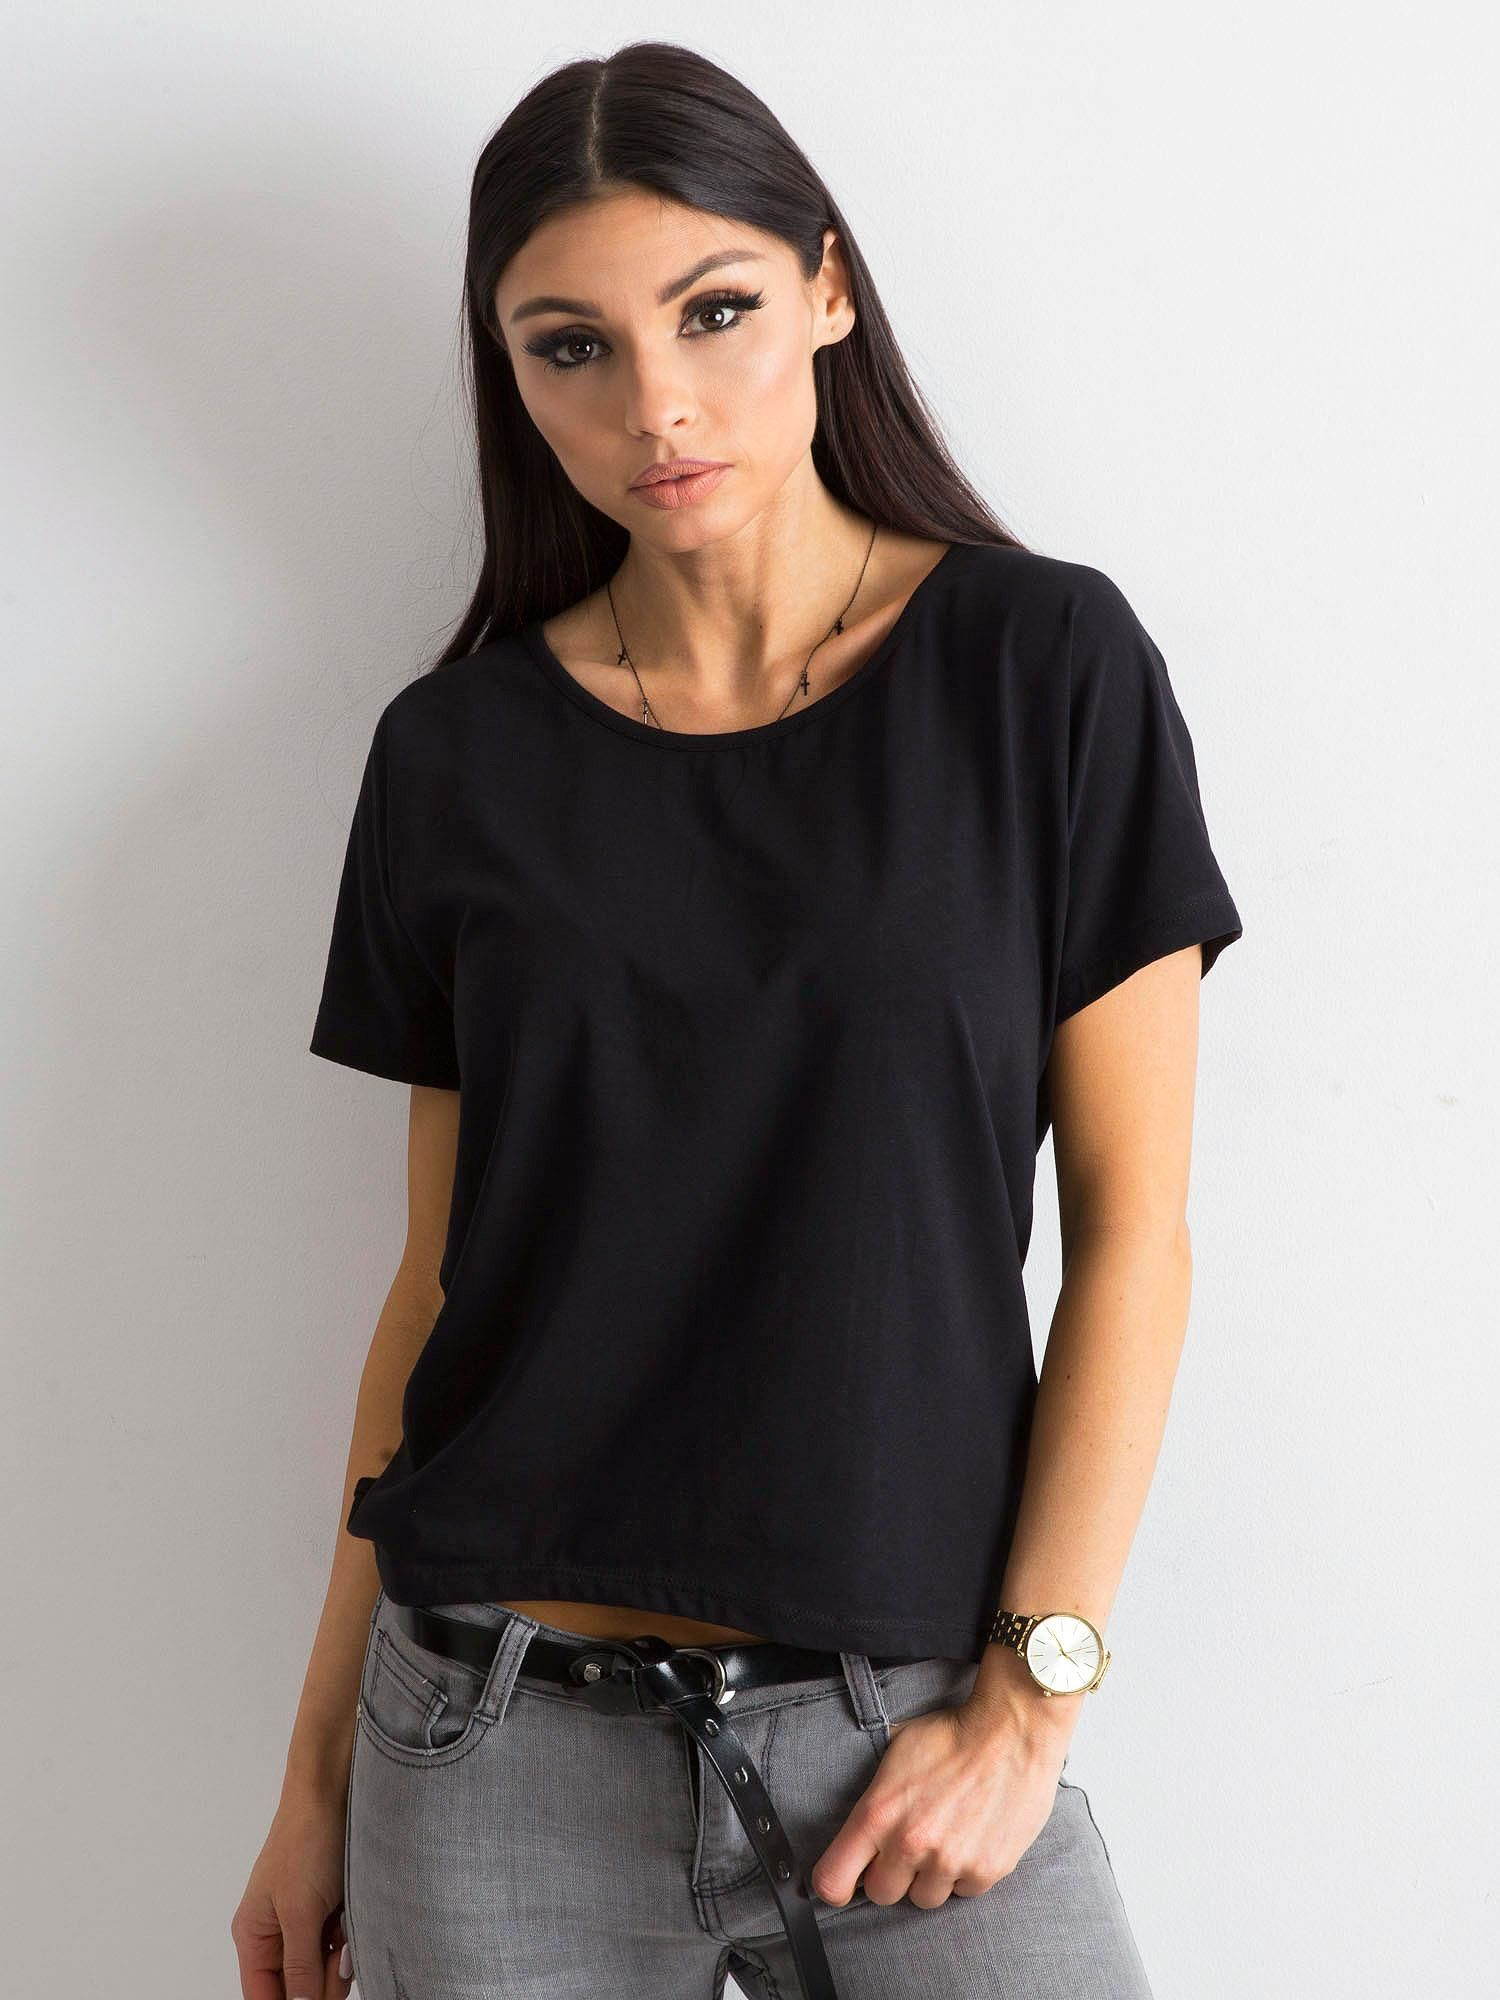 Dámske čierne tričko XS